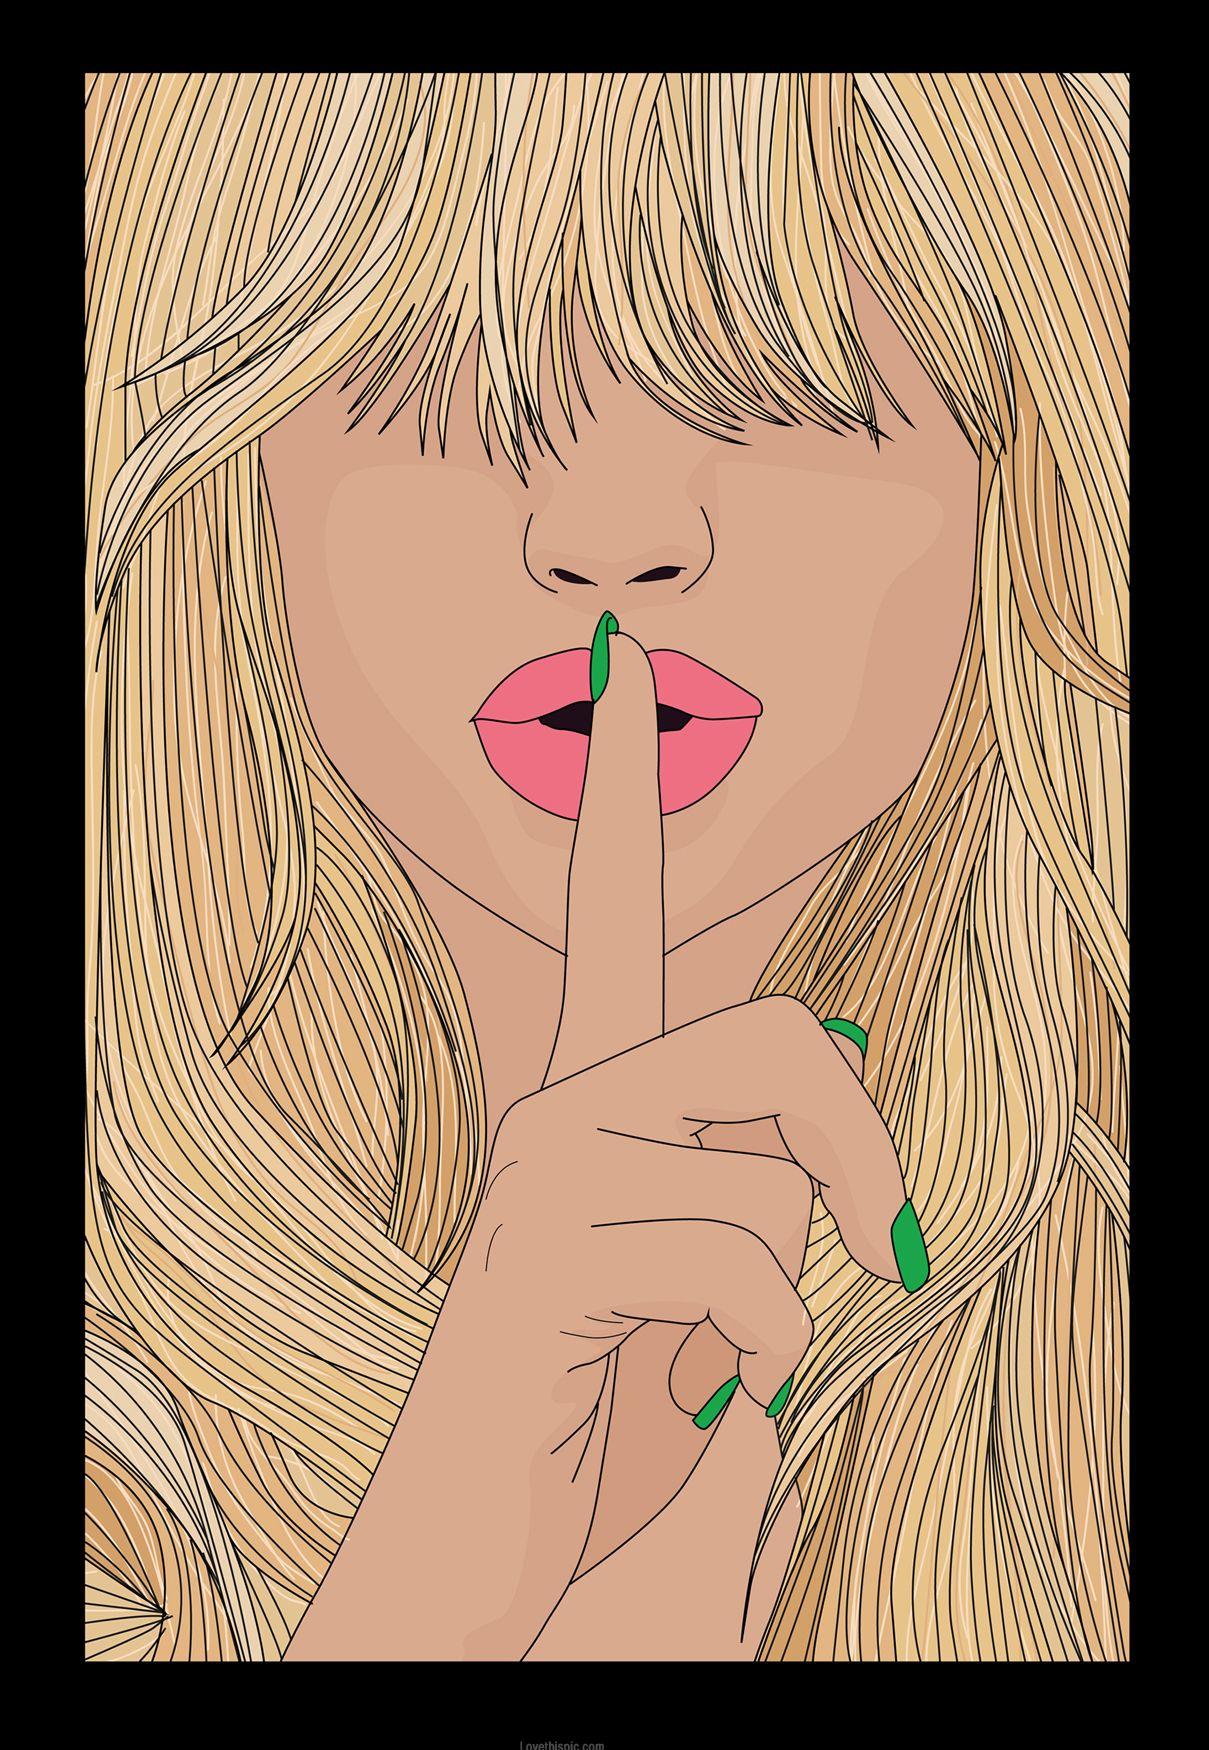 Shhhhh art painting woman illustration digital shh hush in.